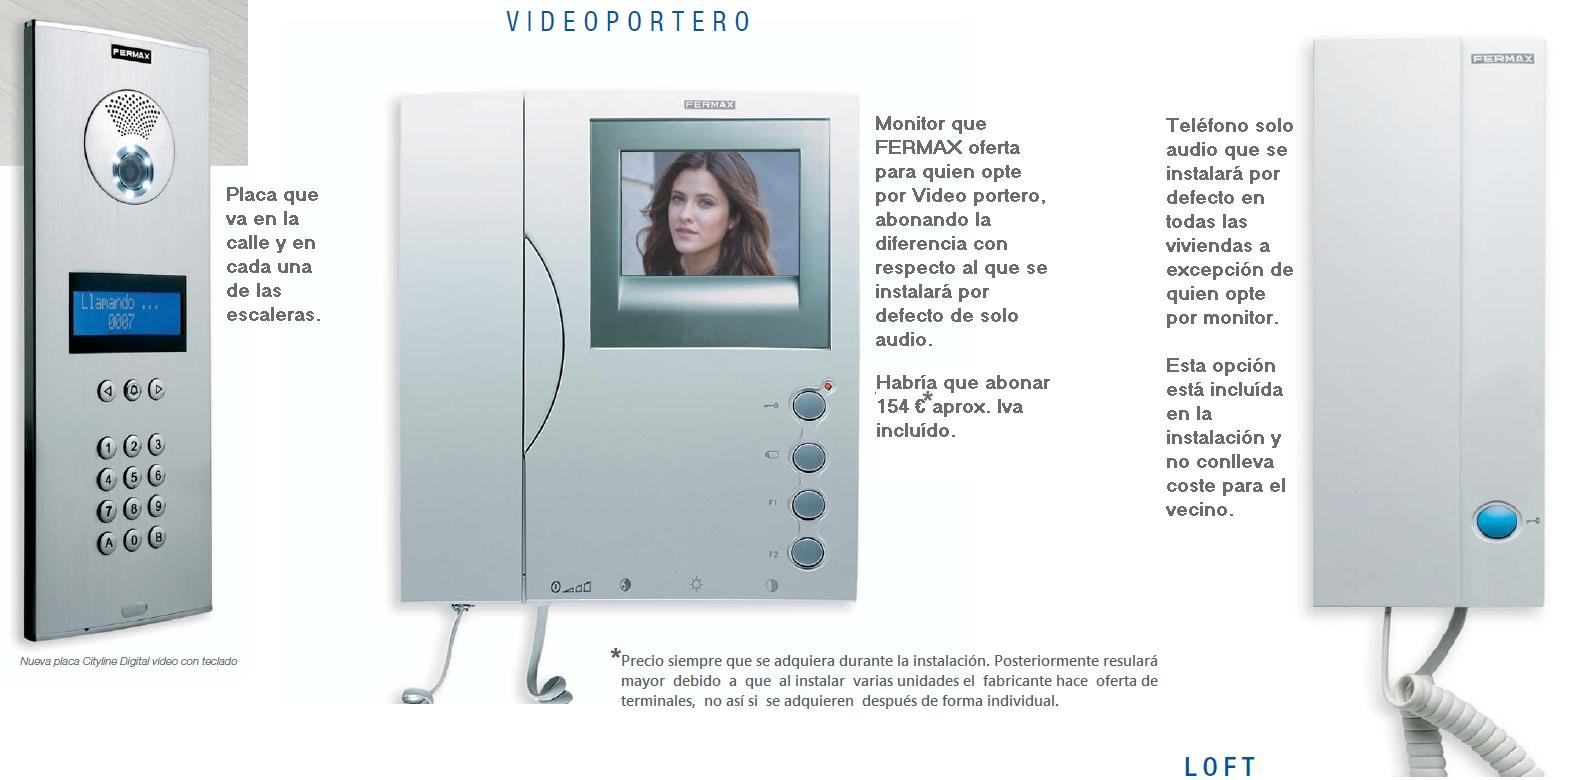 Residencial roma sustituci n porteros autom ticos - Telefono portero automatico ...